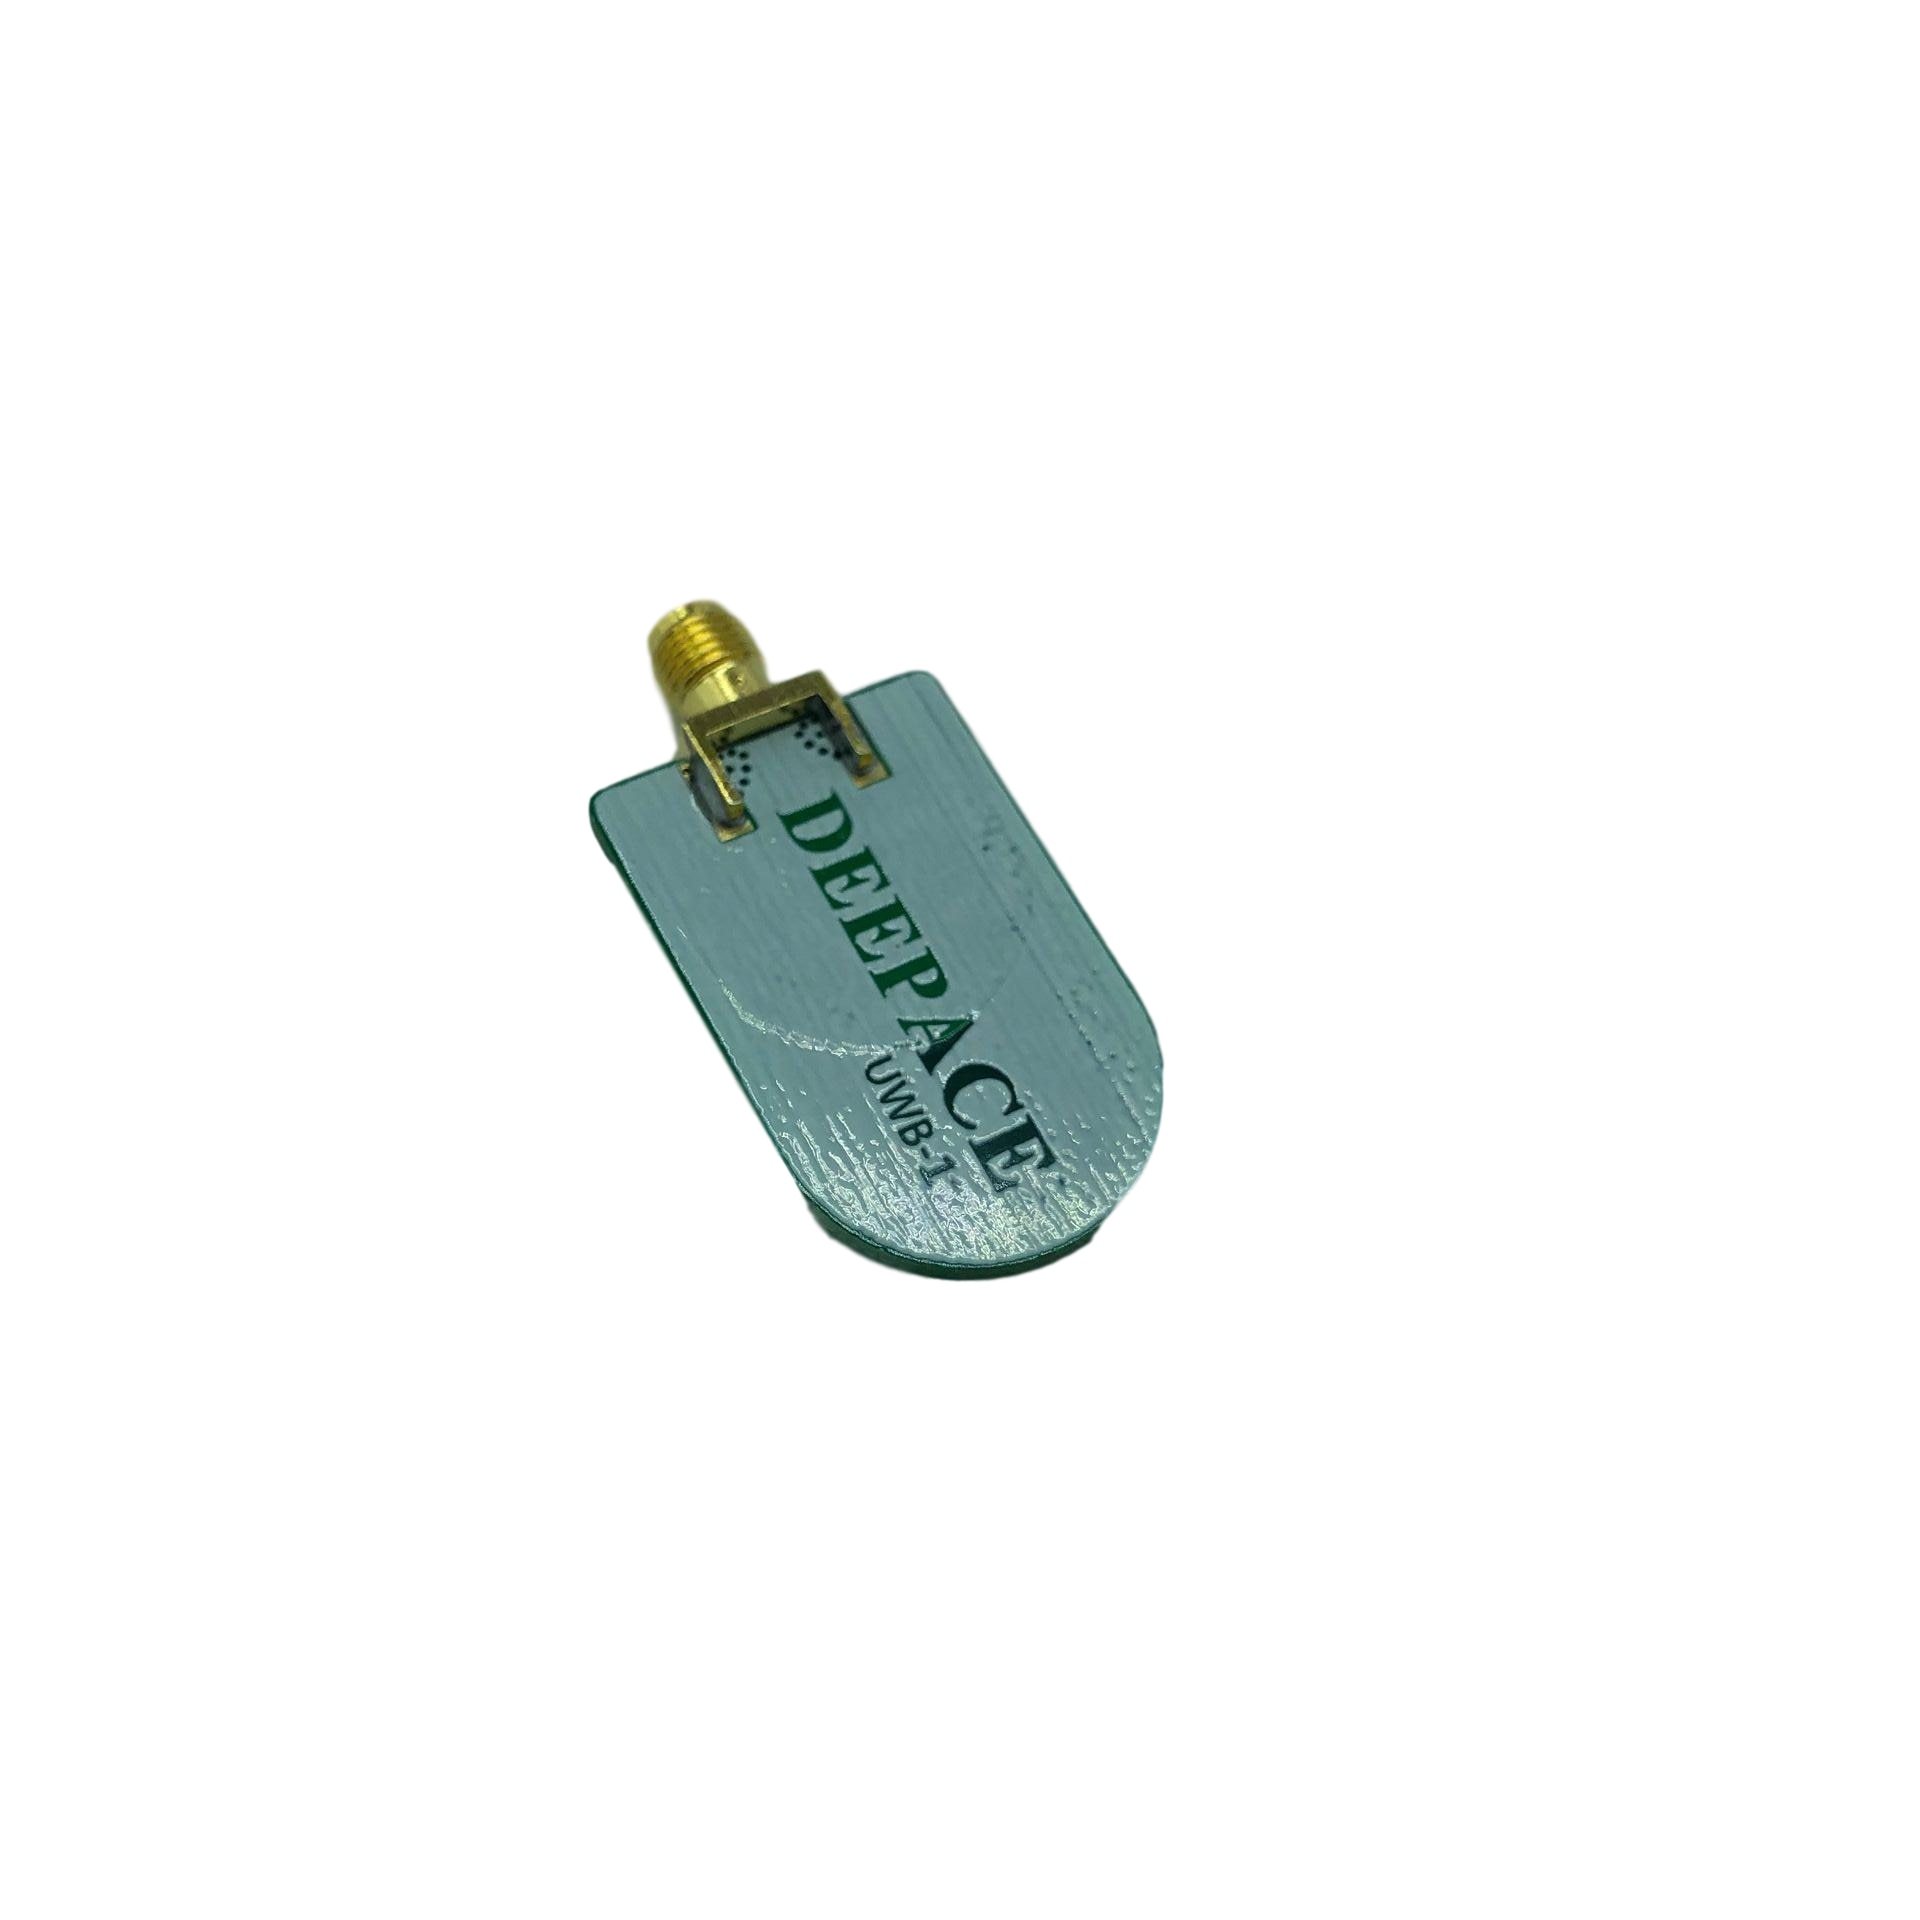 2 uds Deepace UWB-1 3,1 GHz-9GHz antena omnidireccional ultra-ancha